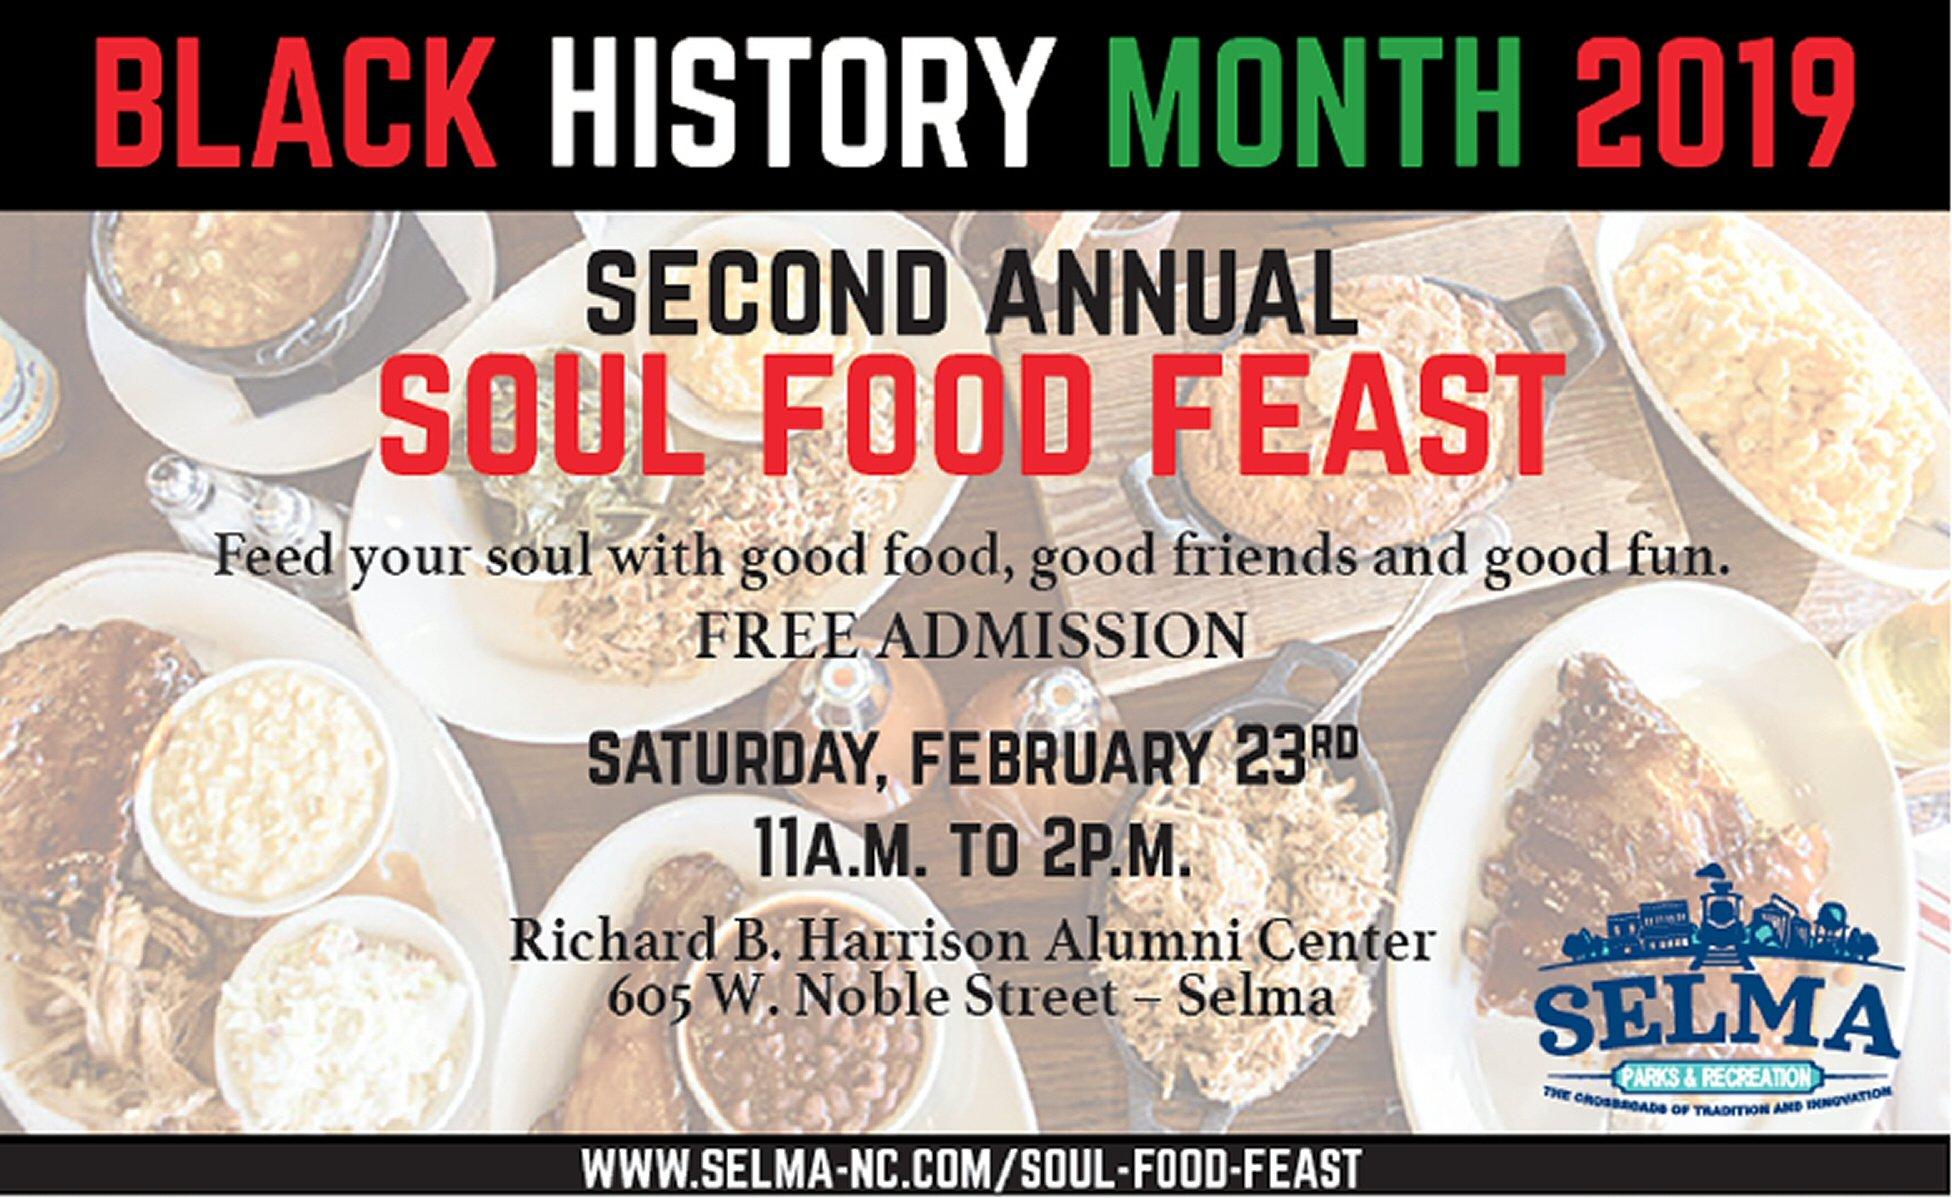 https://0201.nccdn.net/1_2/000/000/137/cec/Soul-Food-Feast-2nd-Annual-Selma-1952x1198.jpg